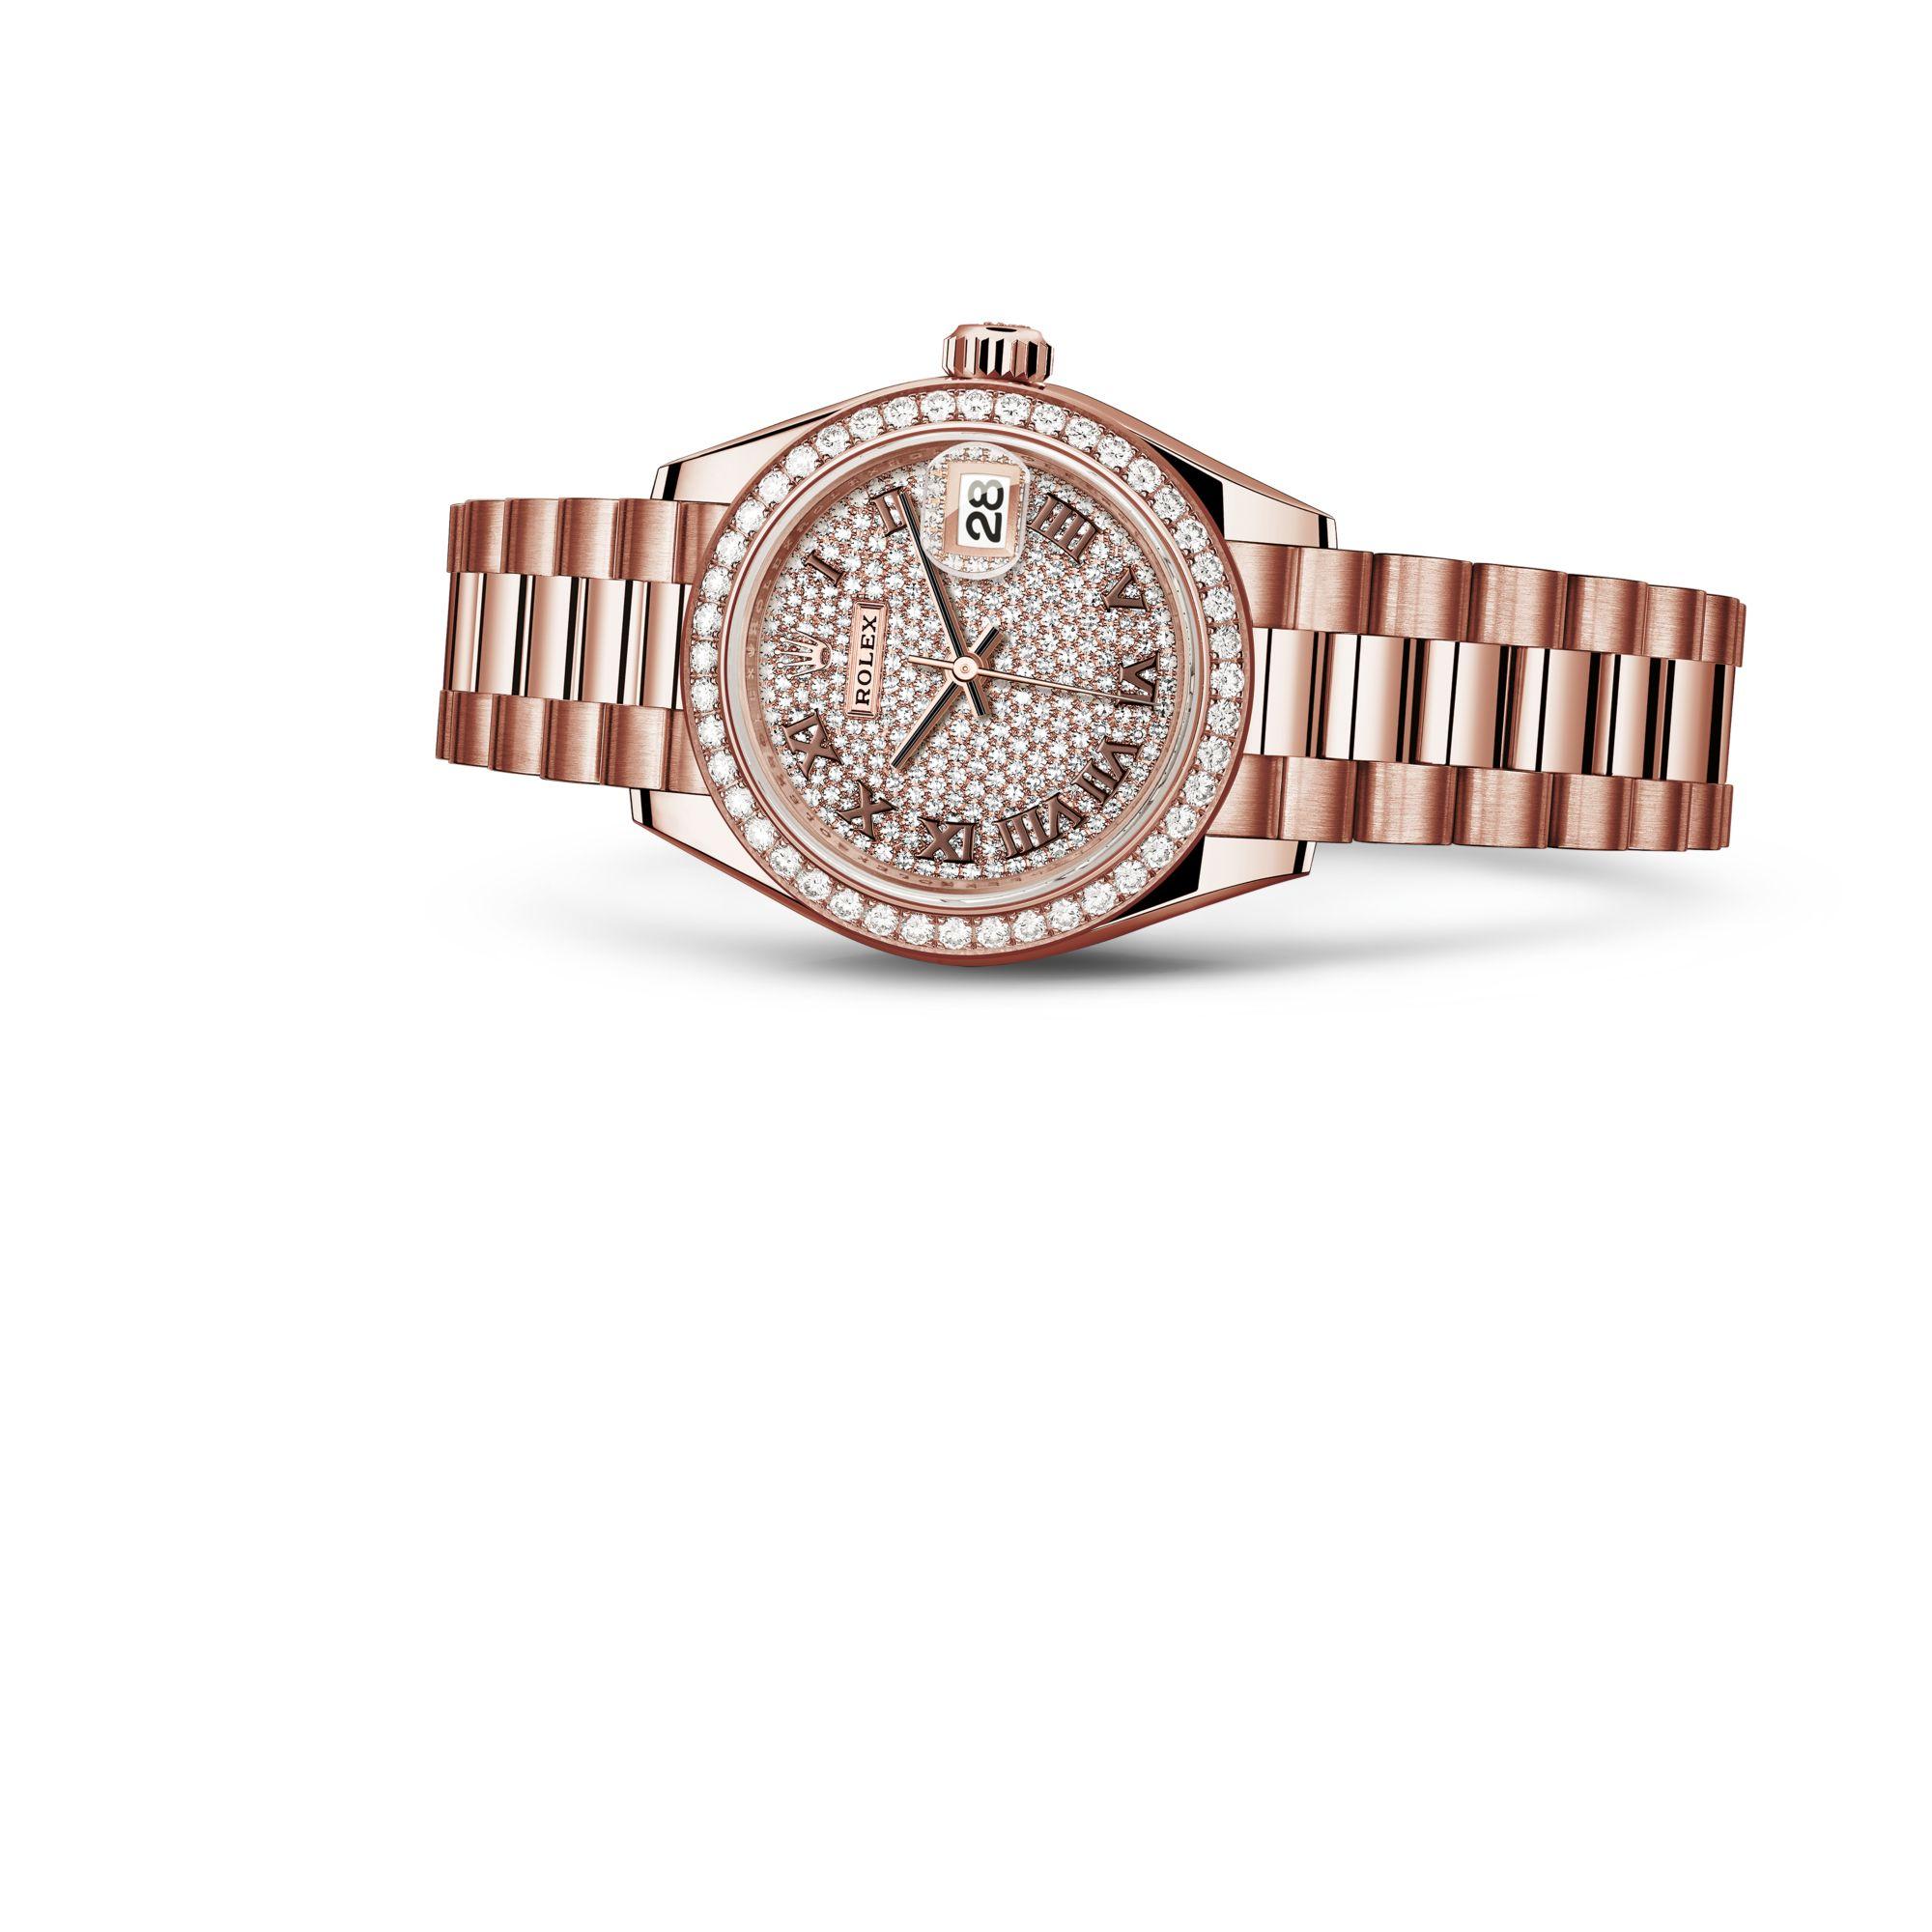 Rolex ليدي ديت جست ٢٨ M279135RBR-0021